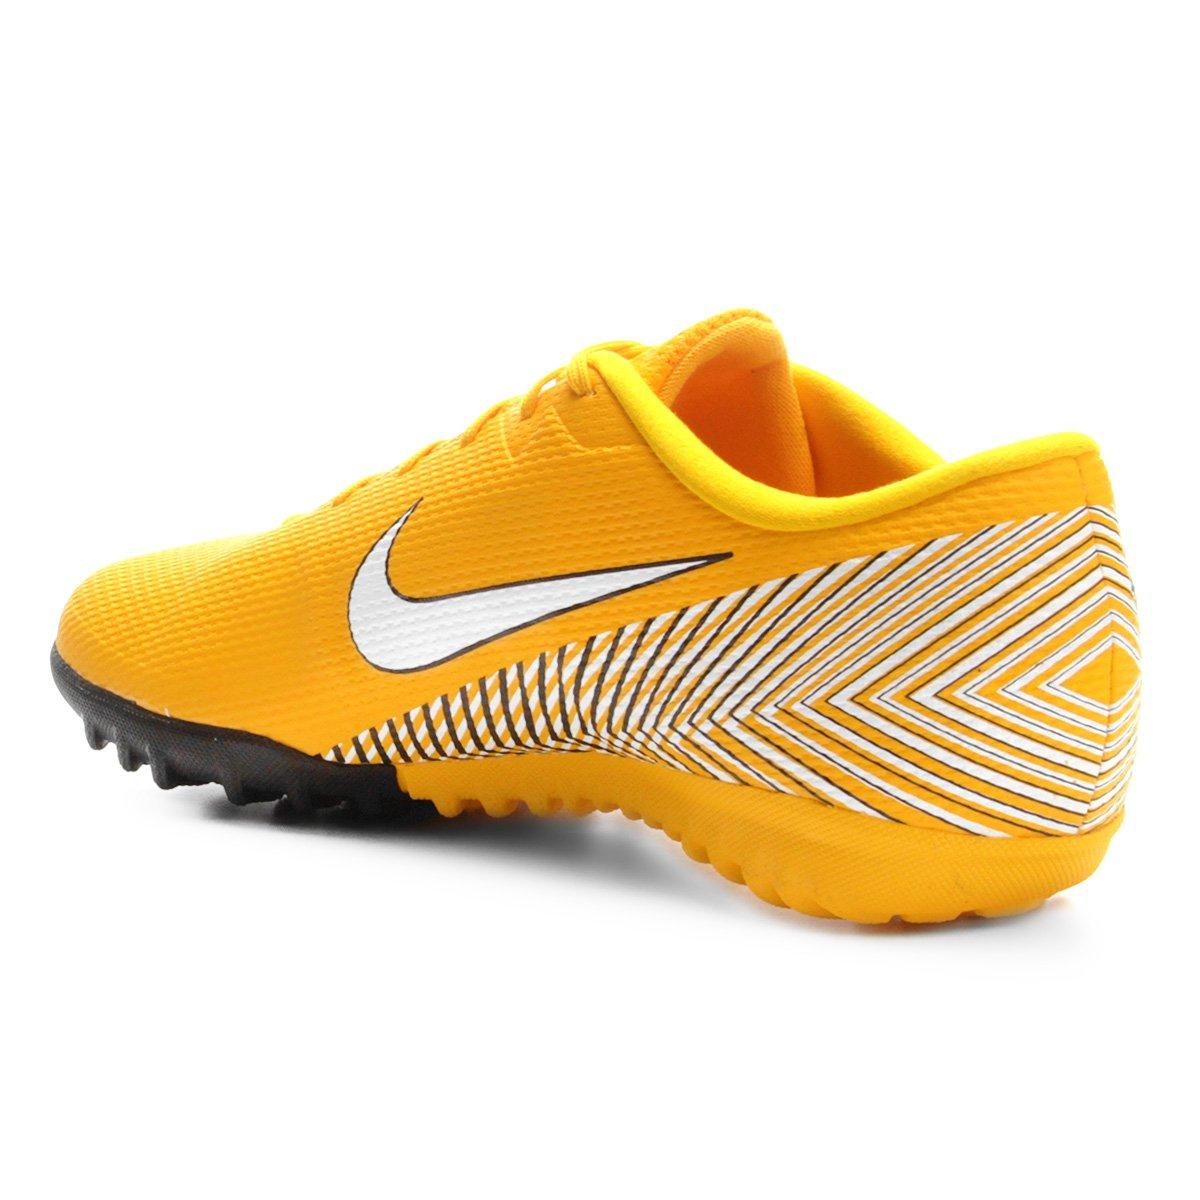 f8671e12f329c Chuteira Society Nike Mercurial Vapor 12 Academy Neymar TF - Compre ...